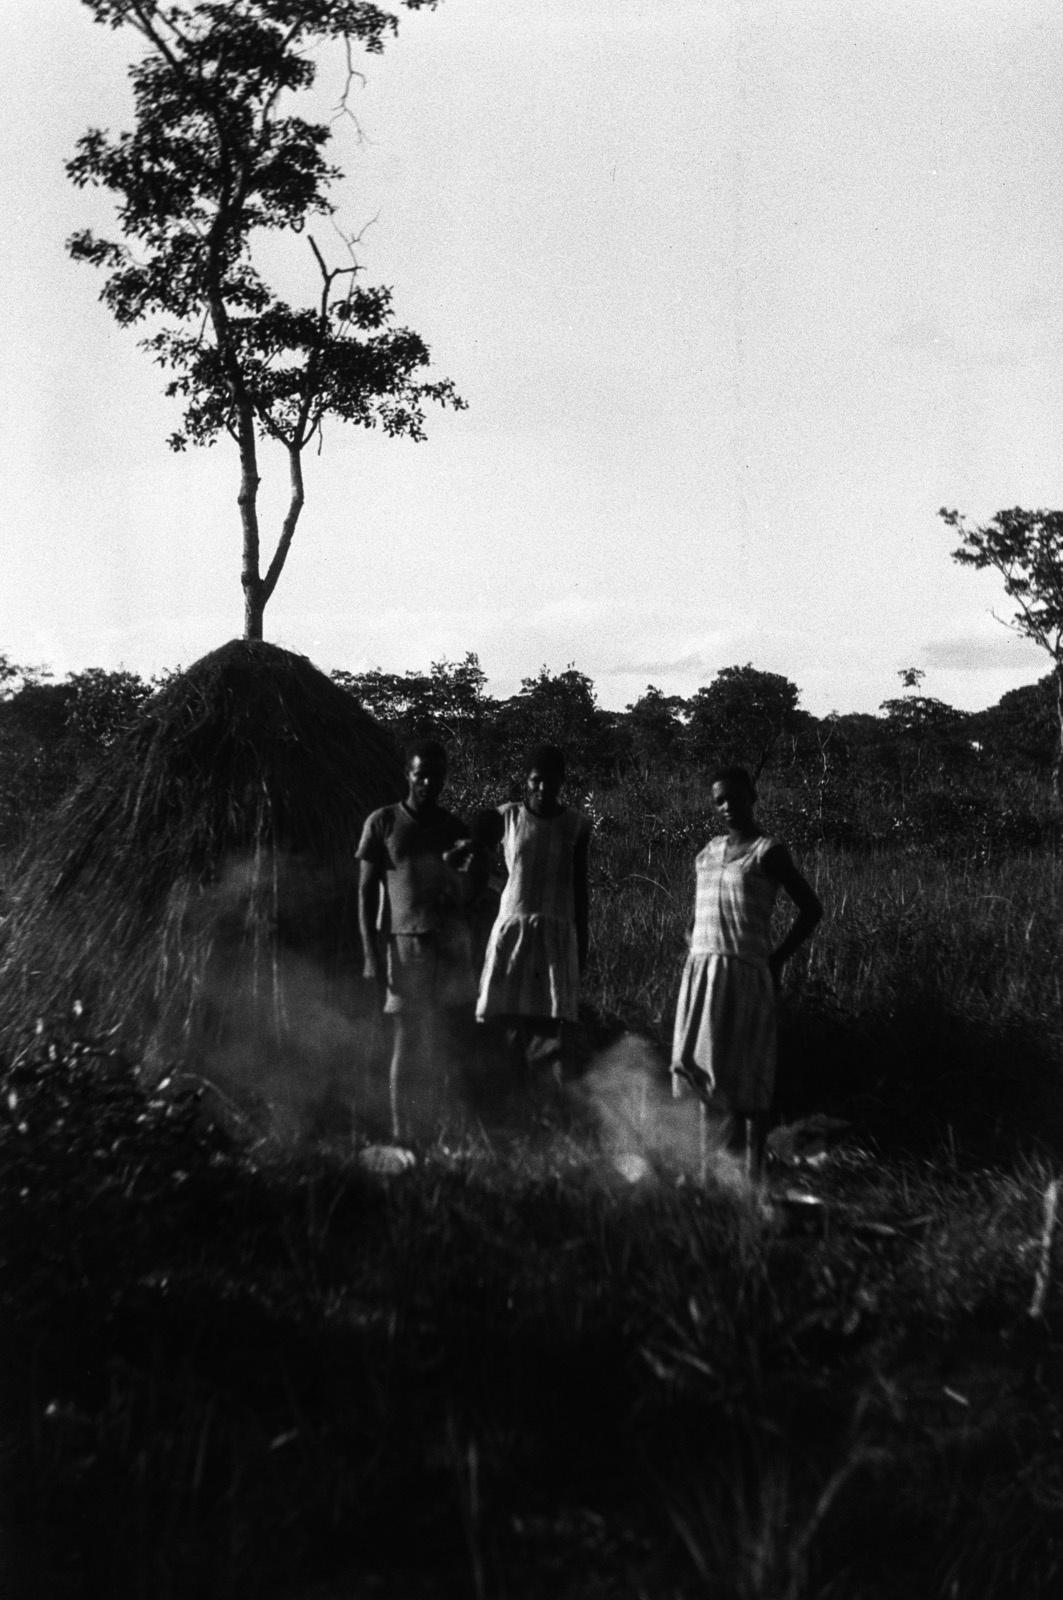 Капири Мпоши. Портрет семьи людей народности лунда.